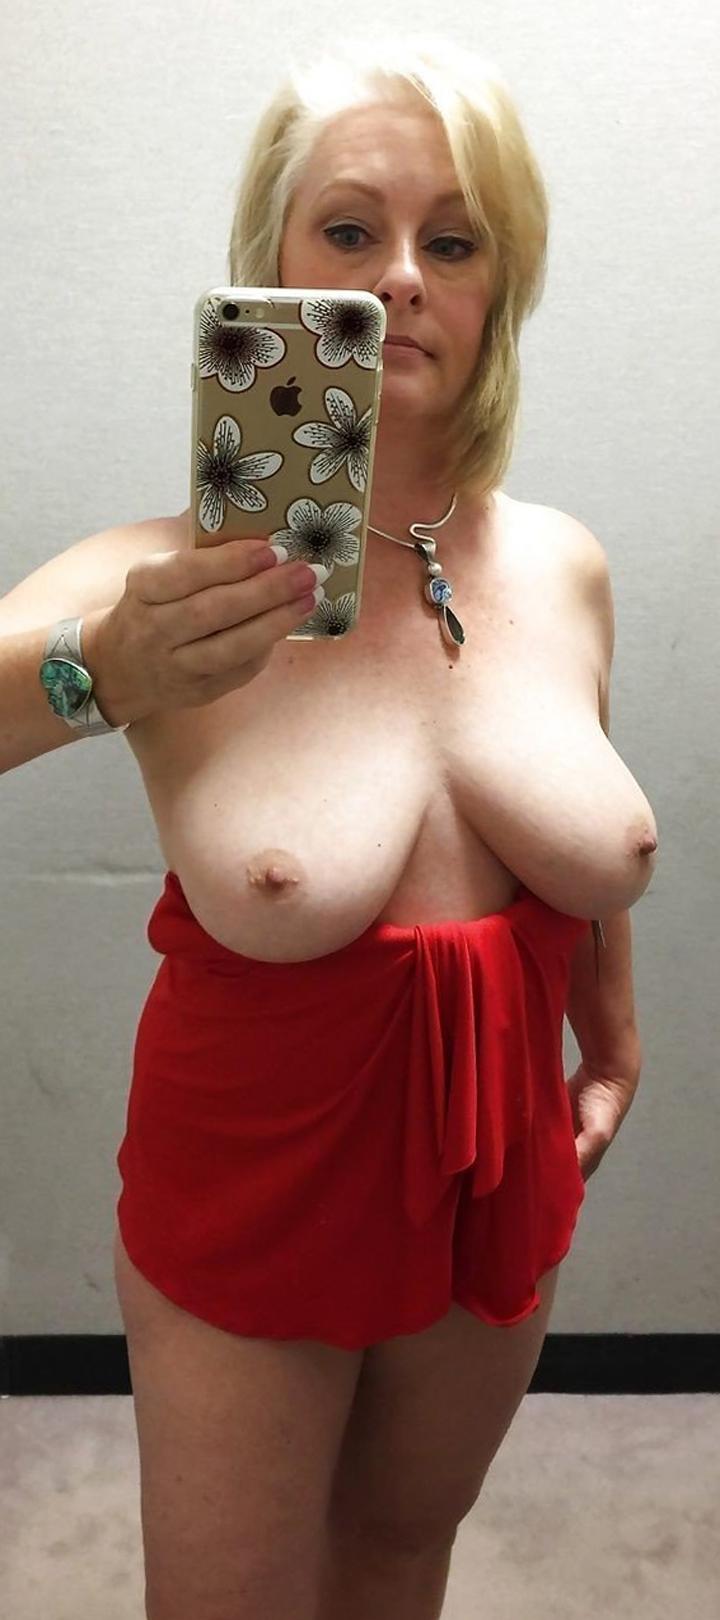 Mature women love naked selfies